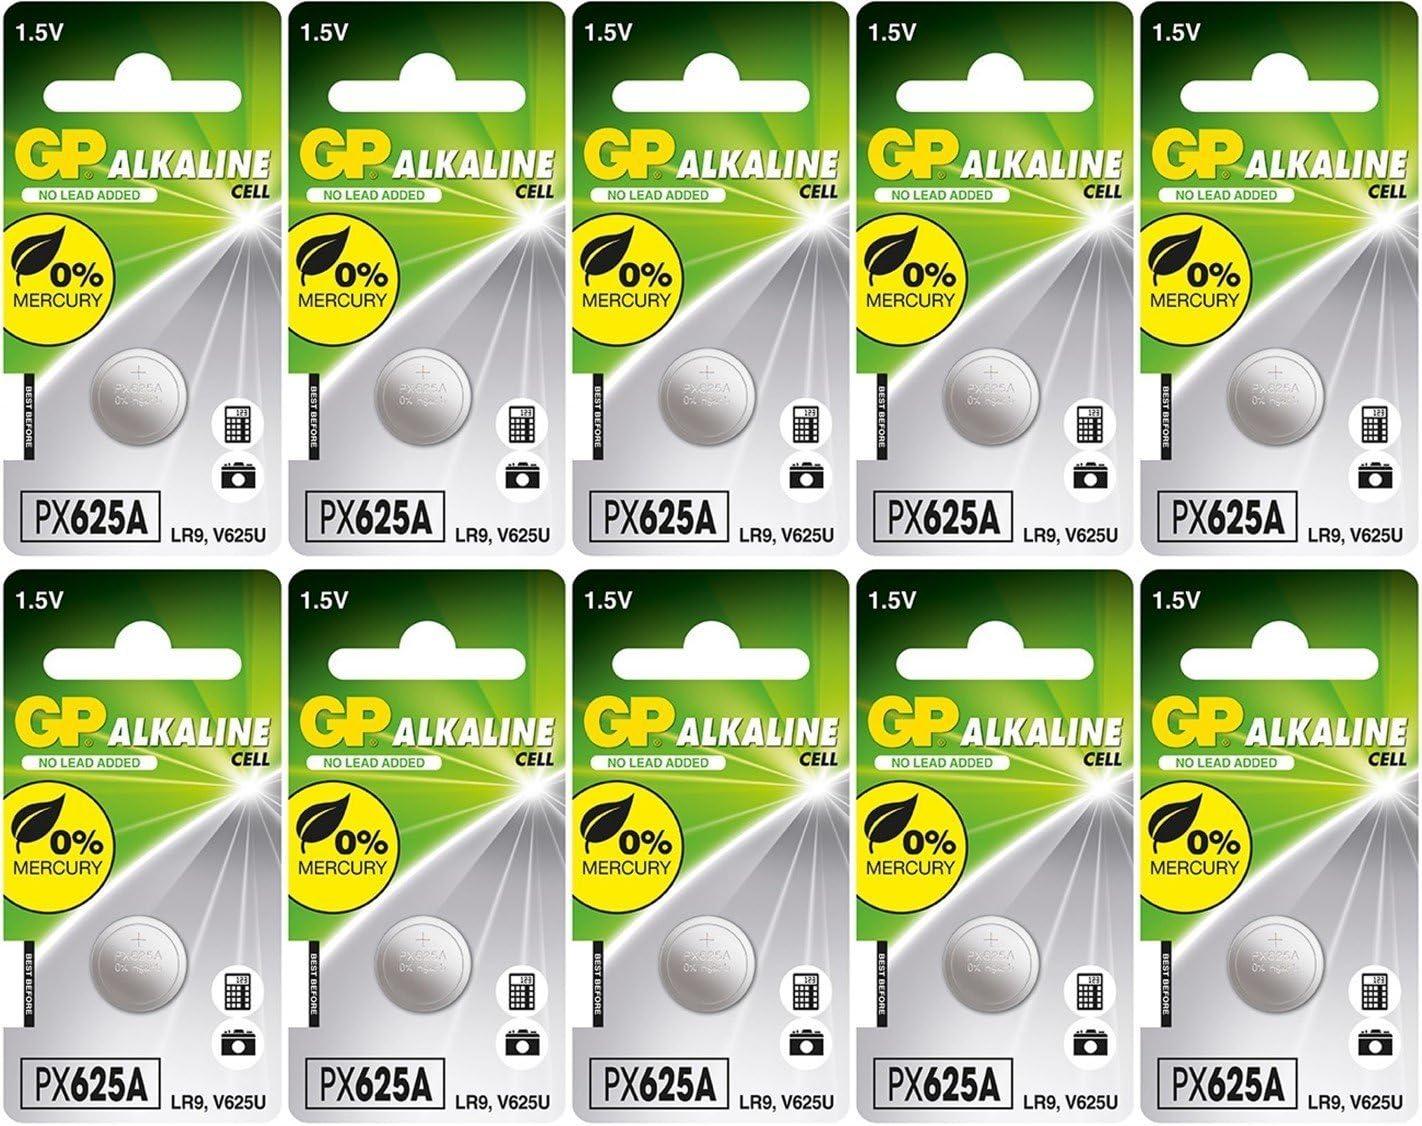 GP 625A Large-scale sale E625GBP K625A PX625A Super-cheap MR09 1.5V Bat V625A 10 Alkaline LR9